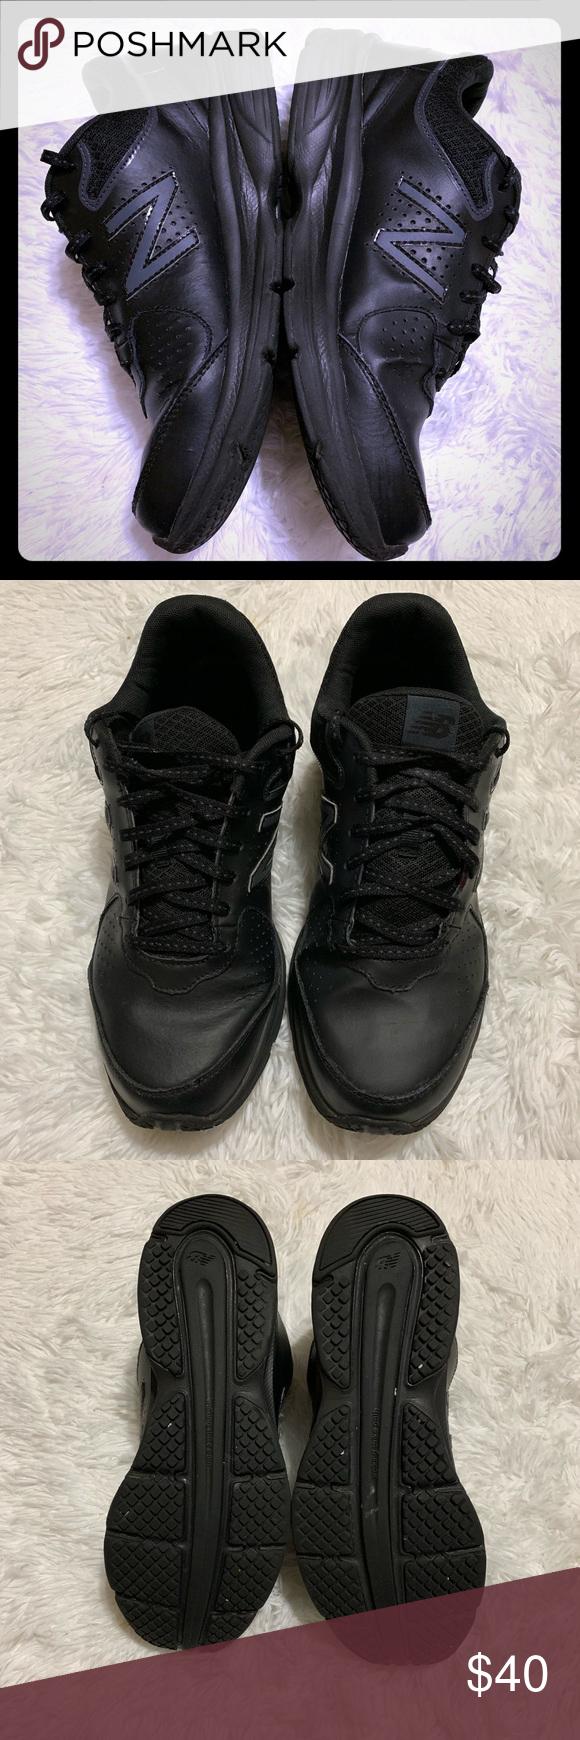 Women's size 11 New Balance Black Walking Sneakers New